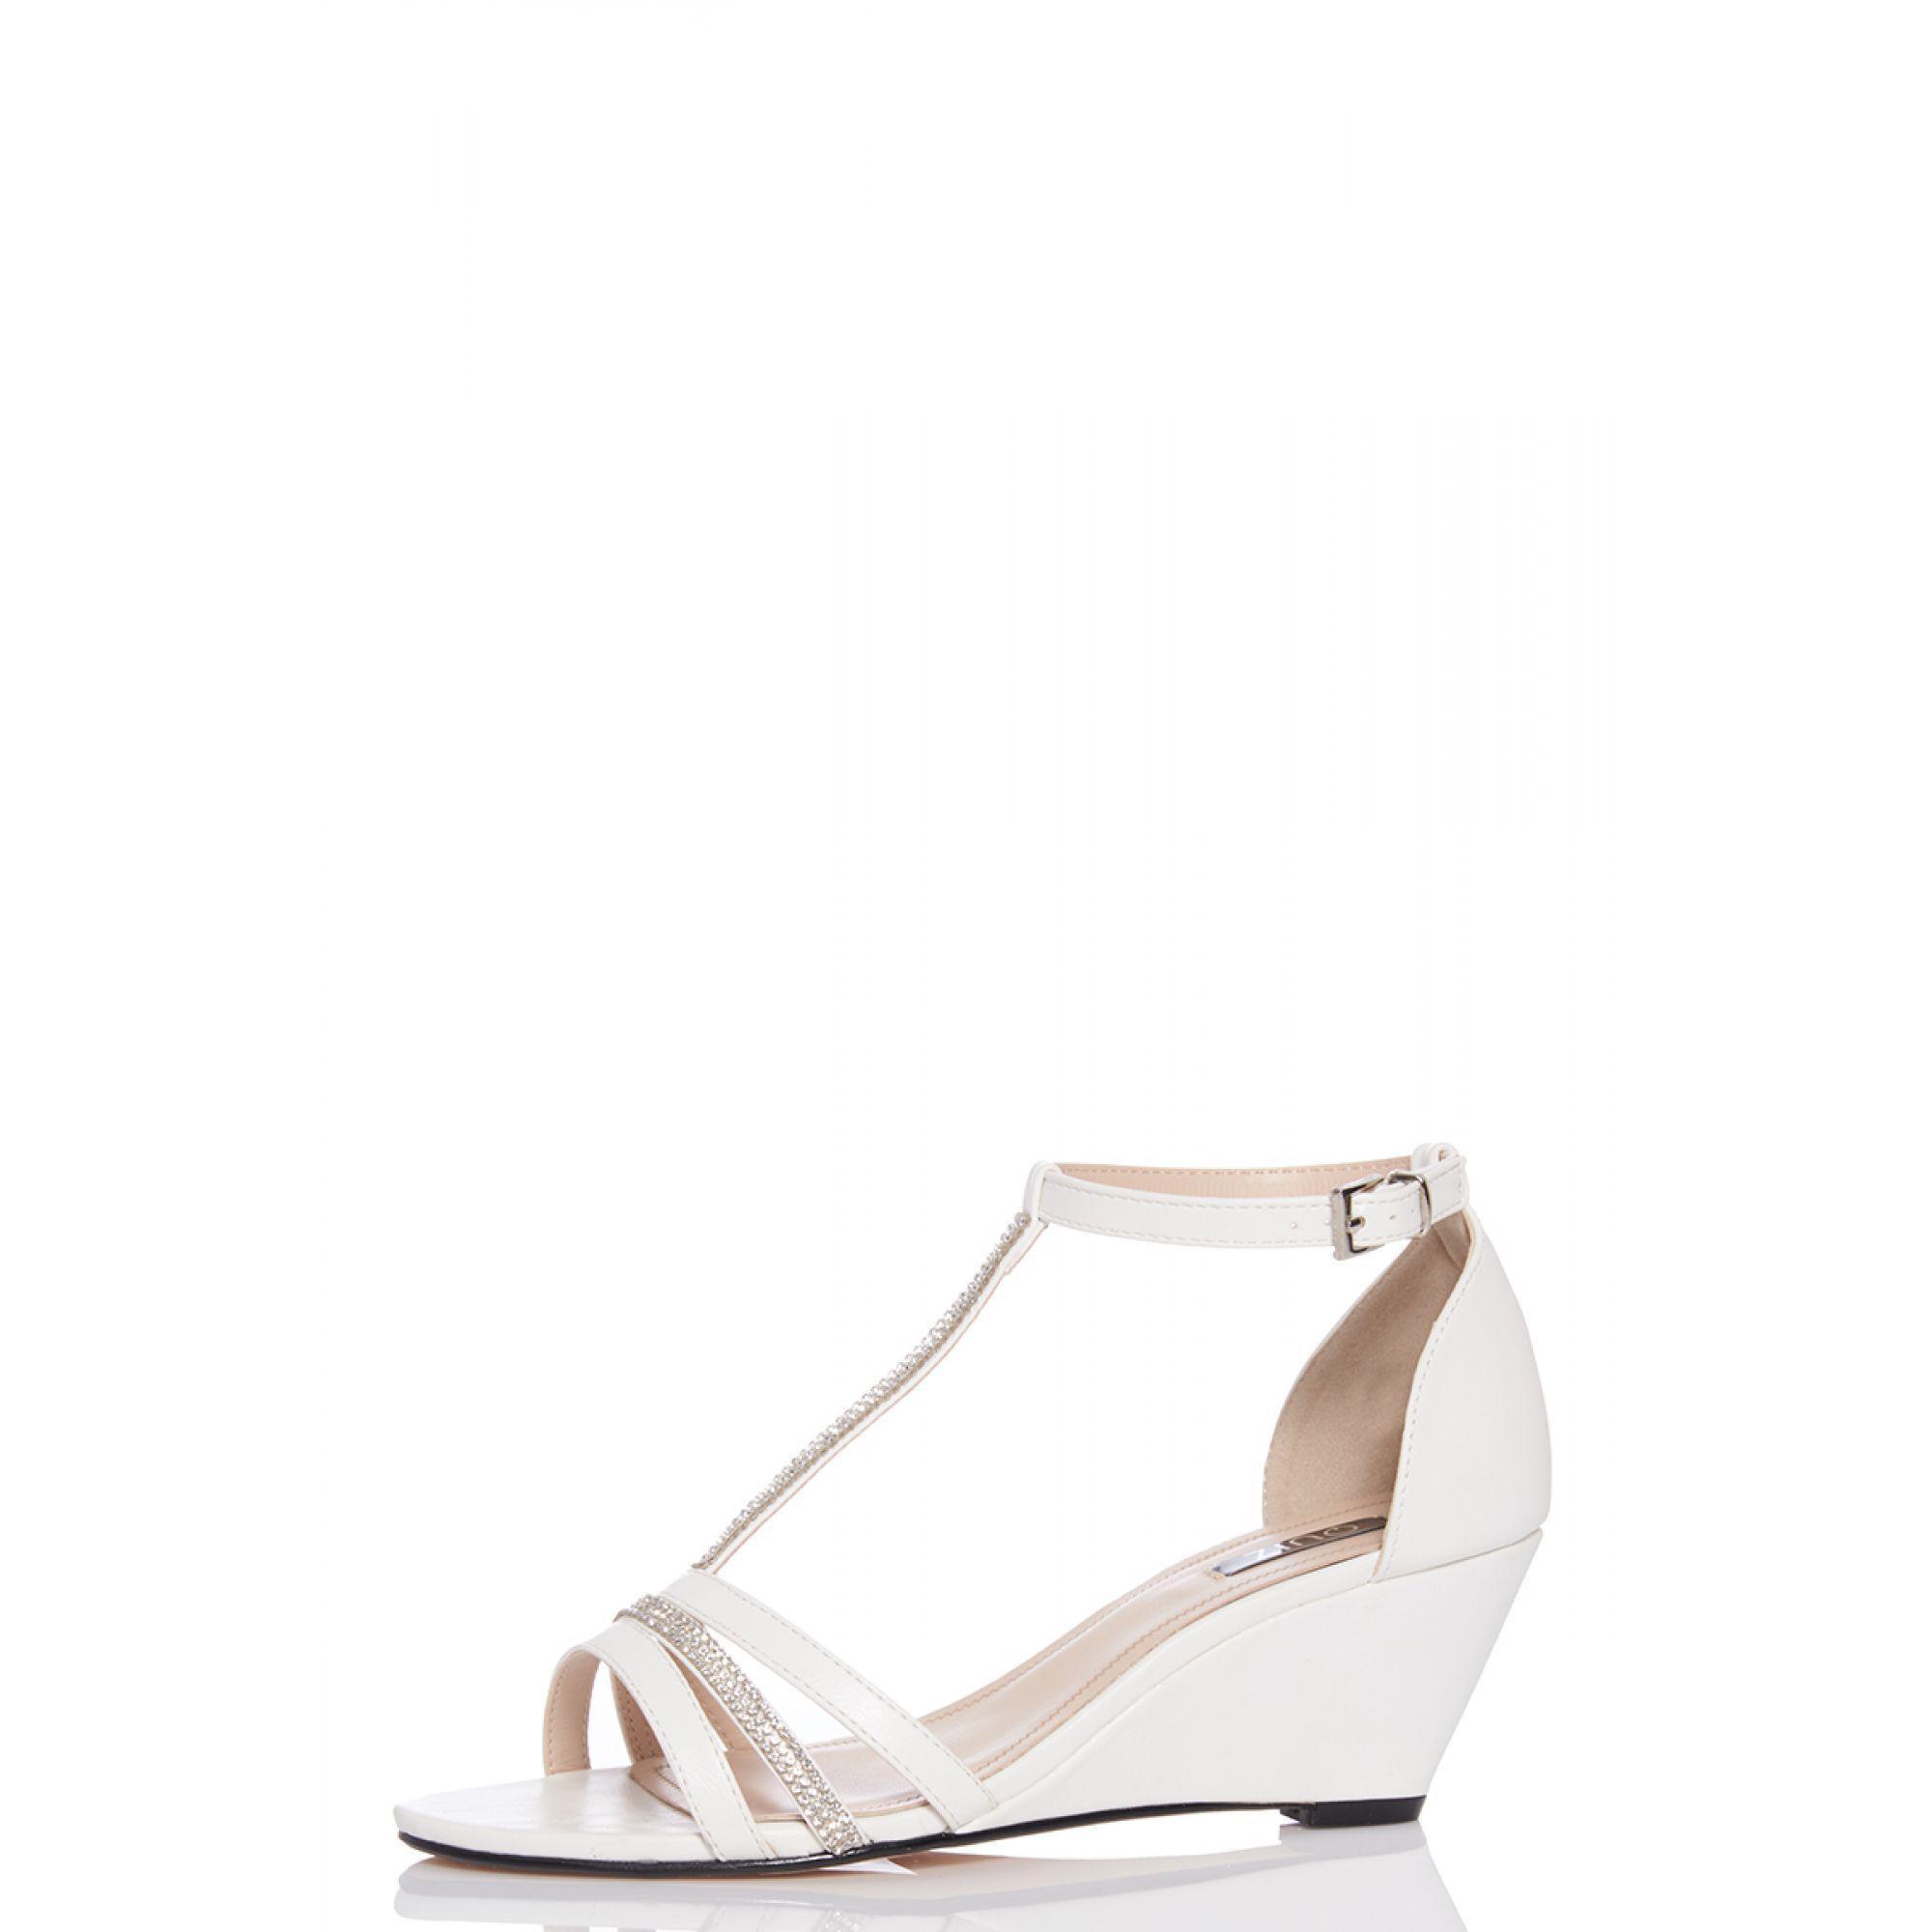 5b4b9f2ea3b Quiz White Diamante Strap Low Heel Wedge in White - Lyst